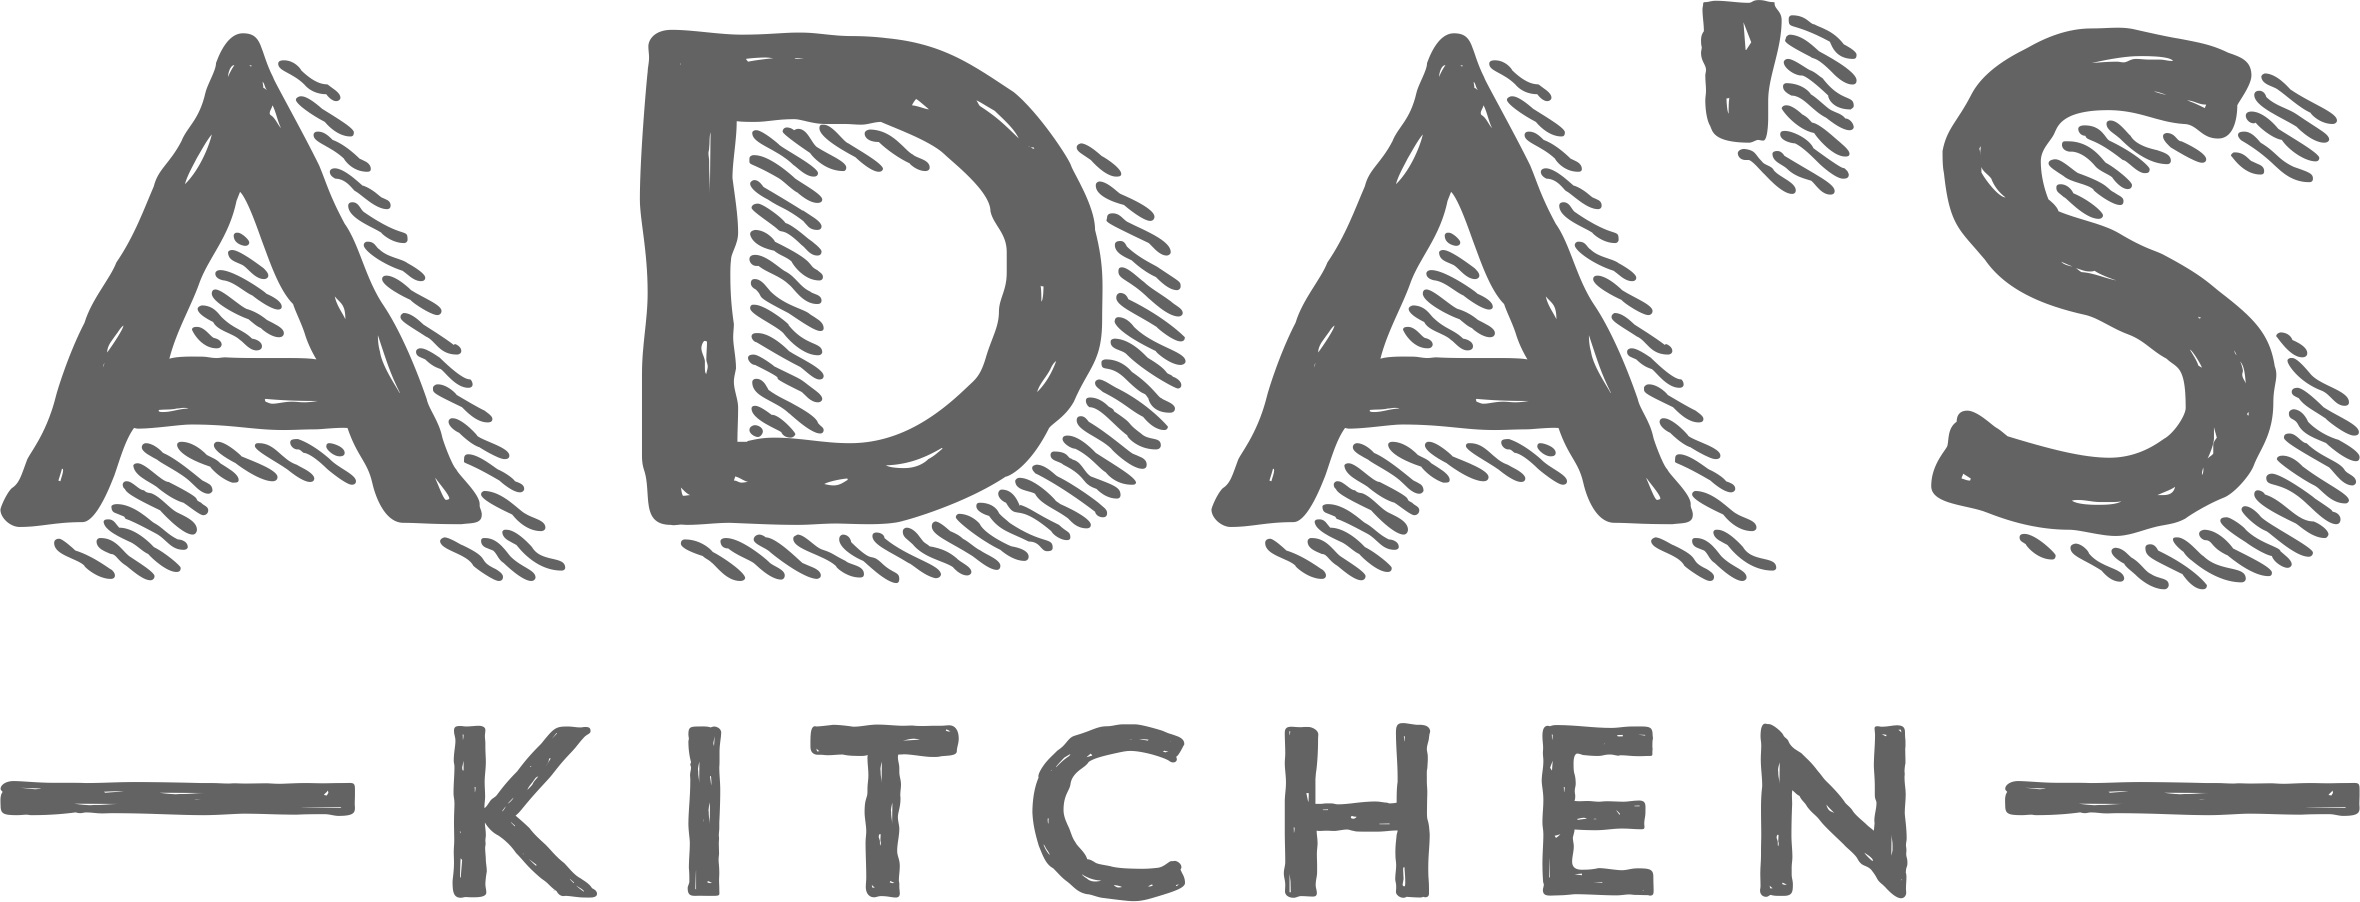 2017_Ada'sKitchen_Logo_WhiteBlack_PNG.png